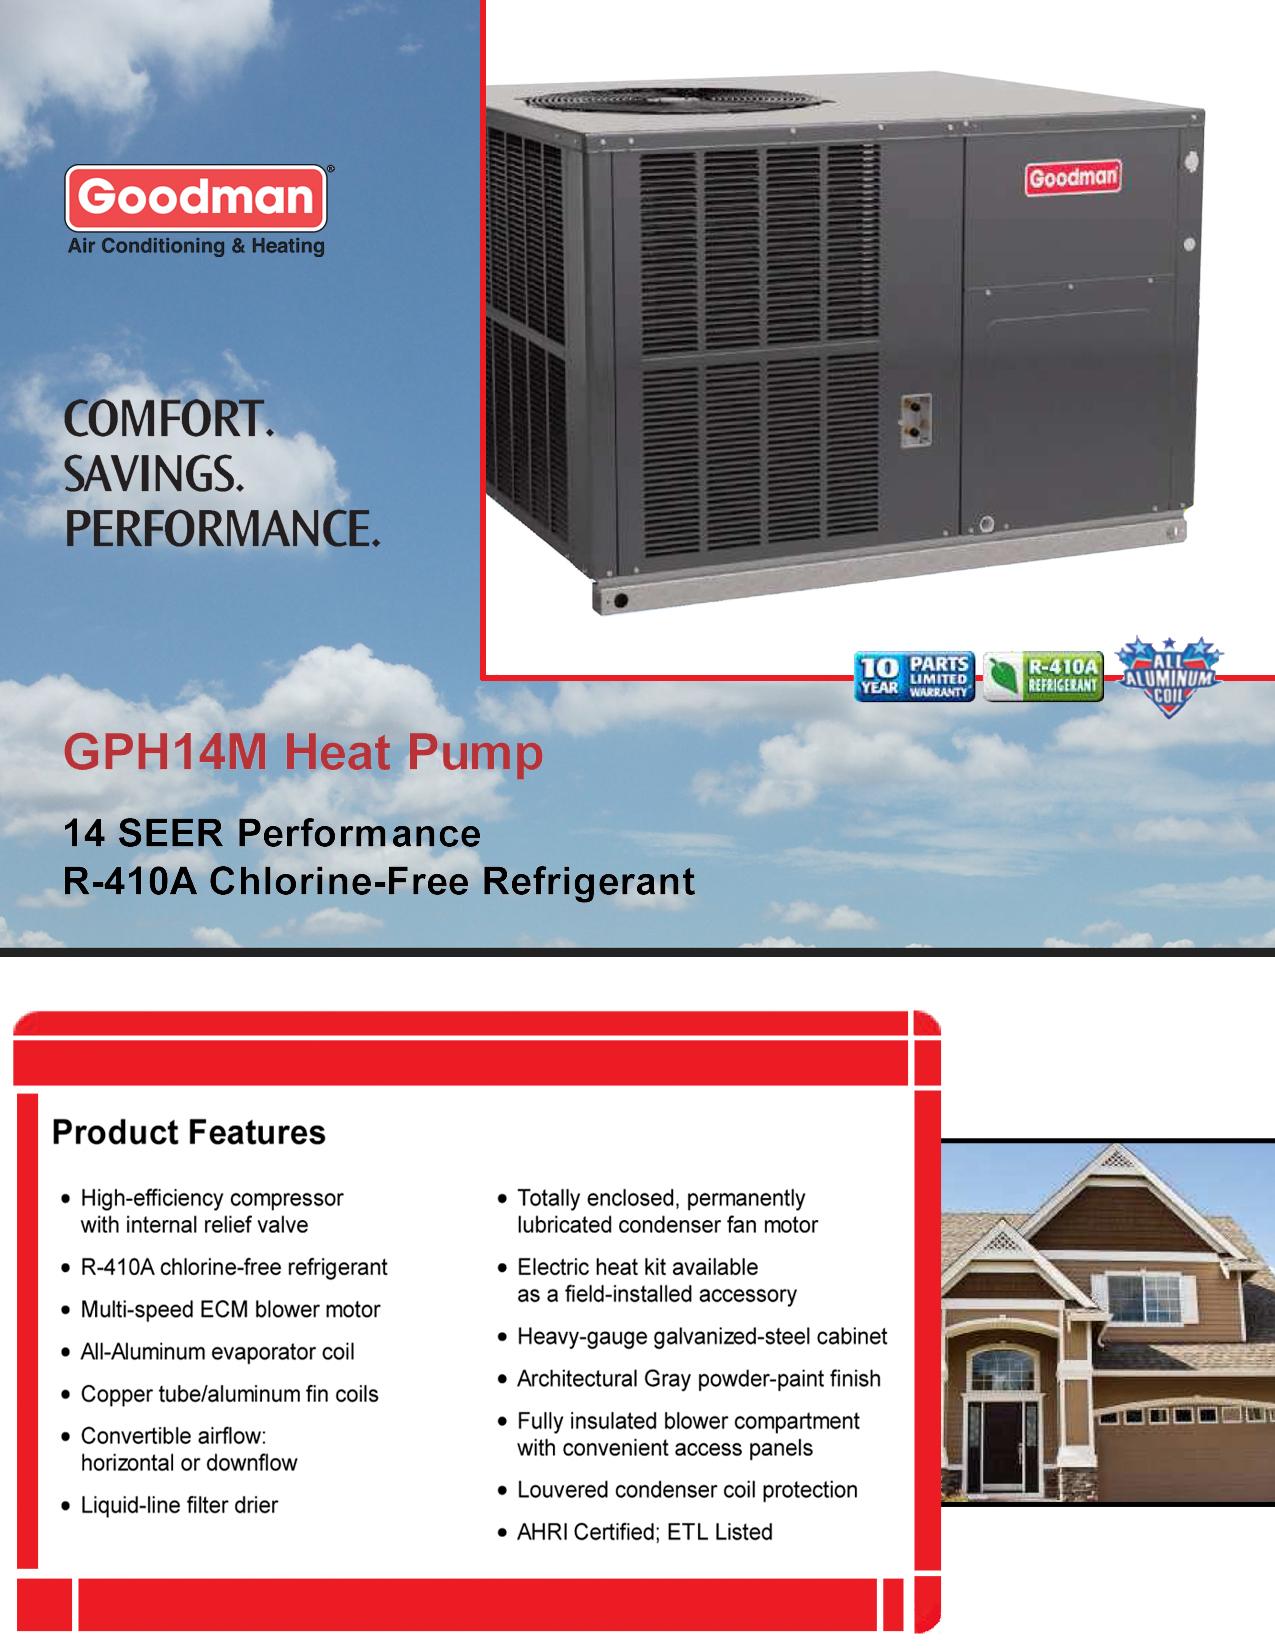 goodman 4 ton heat pump wiring diagram mitsubishi l300 alternator 13 seer 3